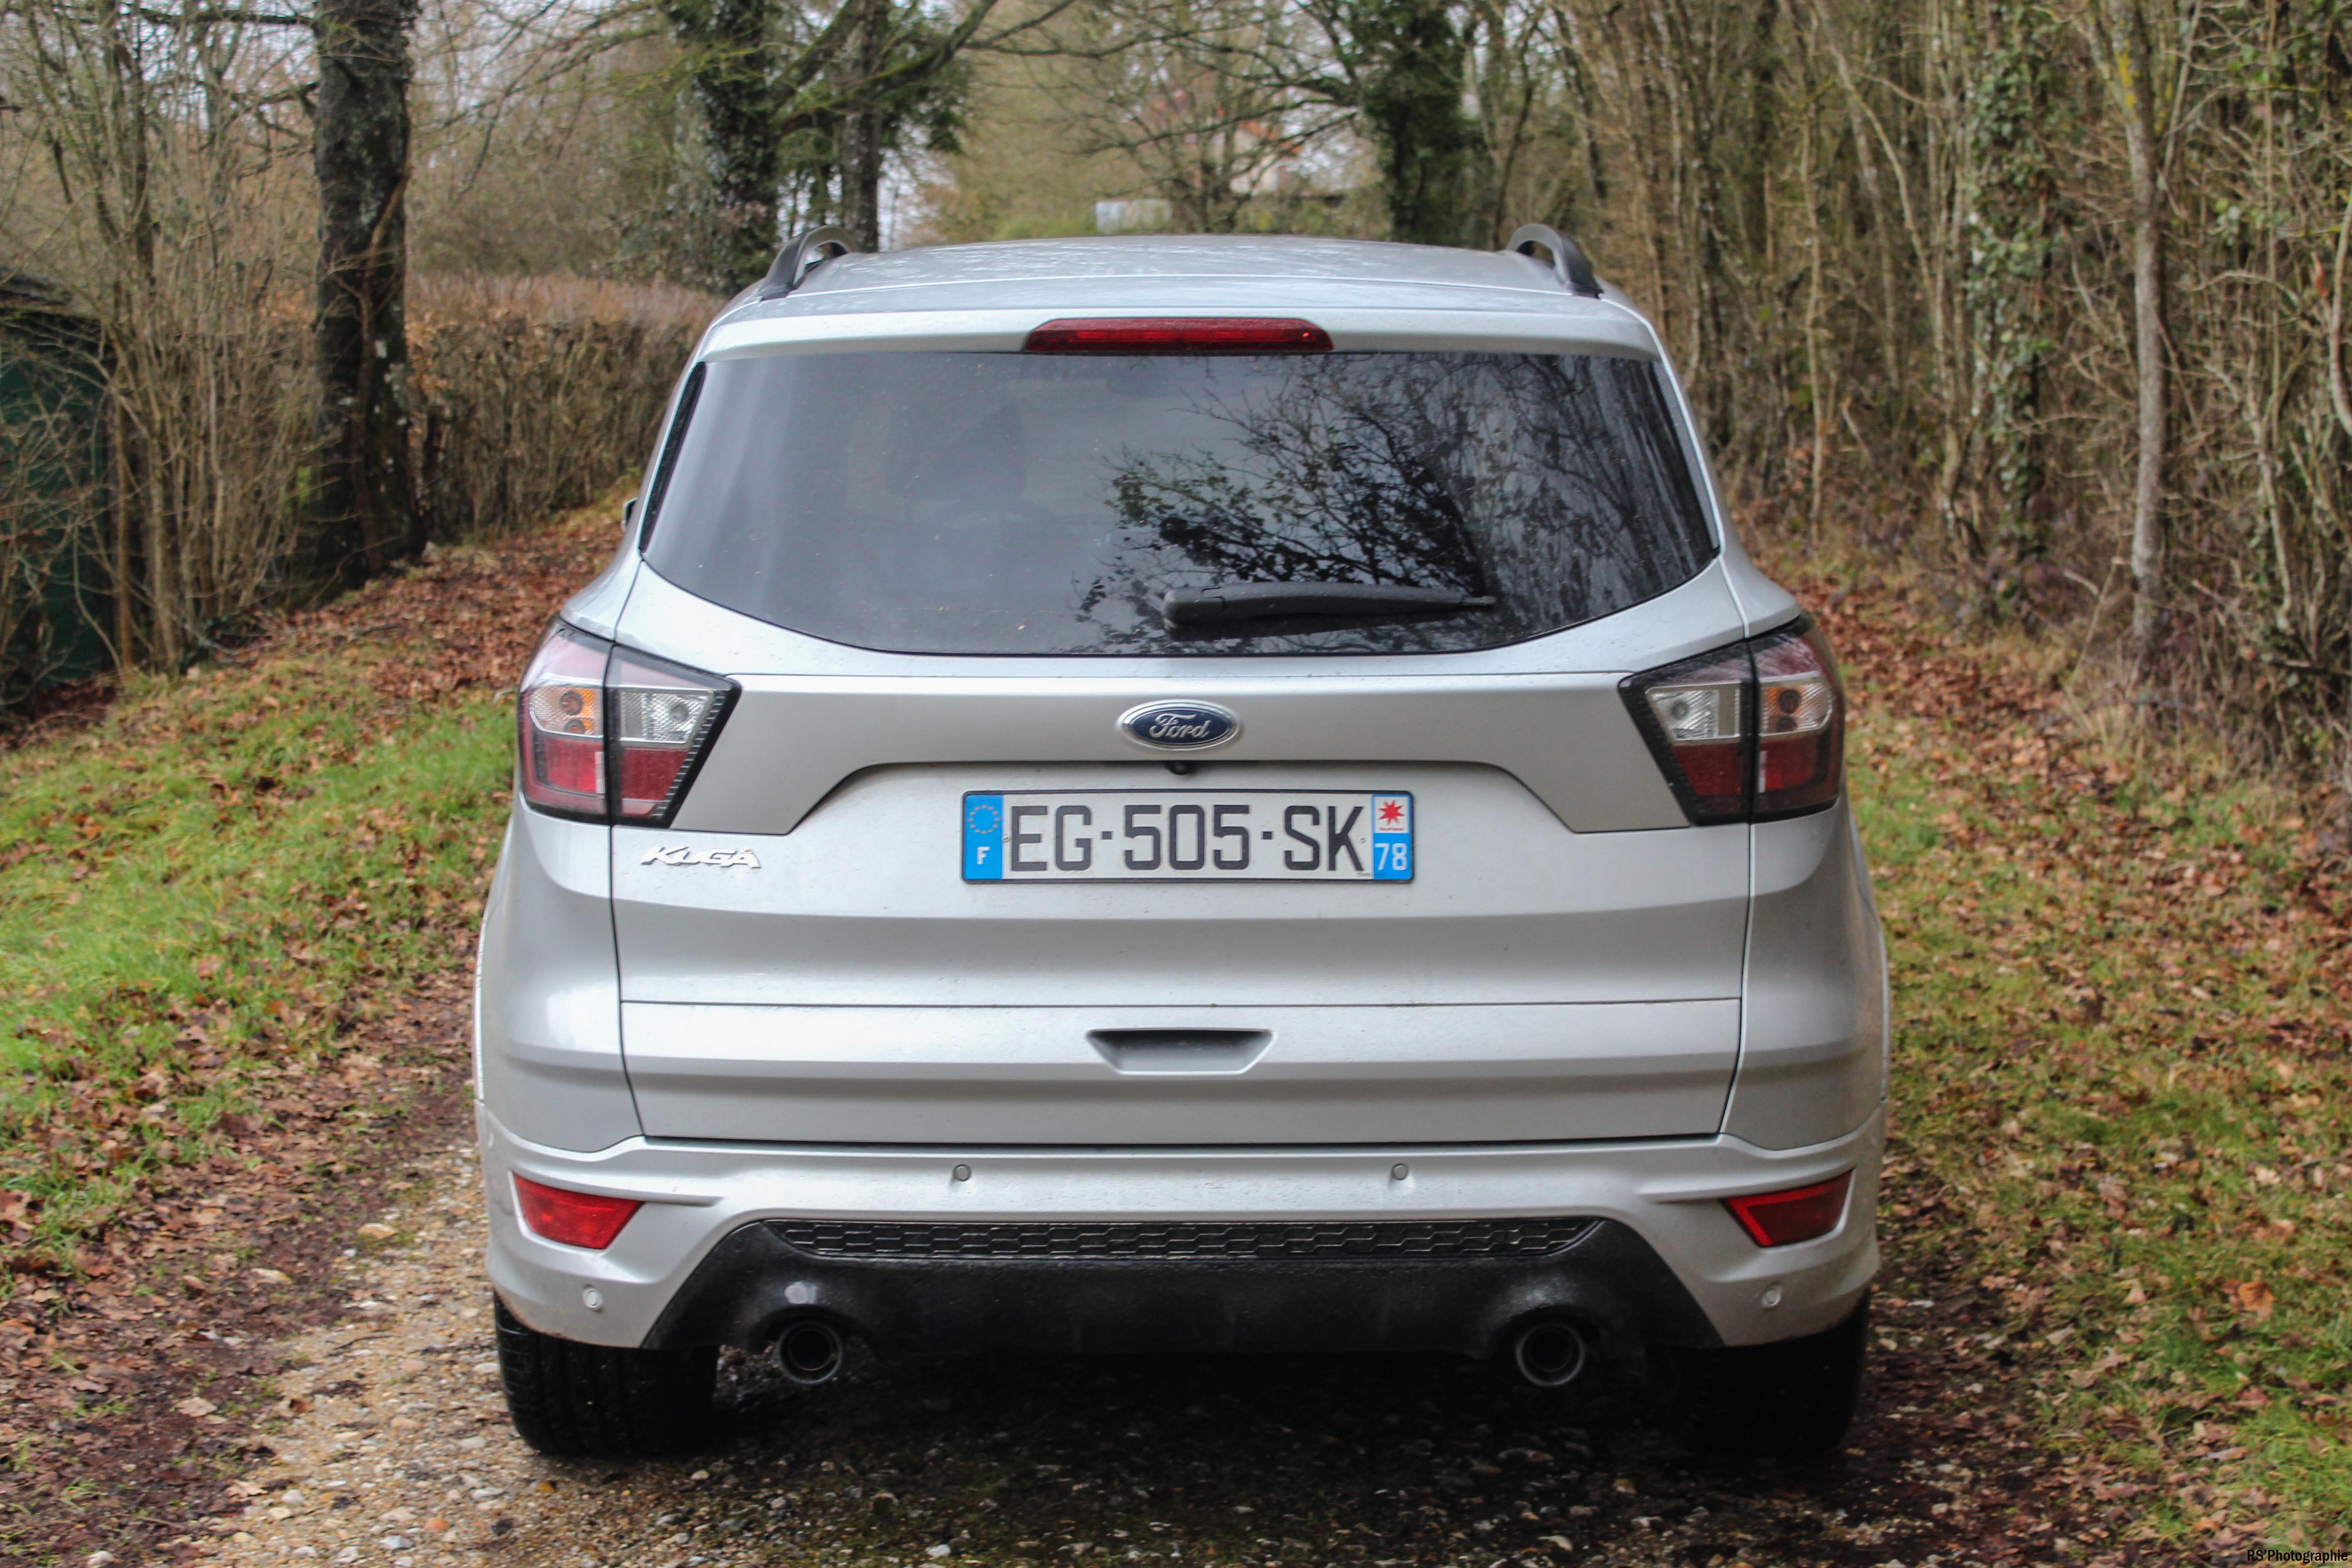 FordKuga6-ford-kuga-150-arriere-rear-arnaud-demasier-rsphotographie